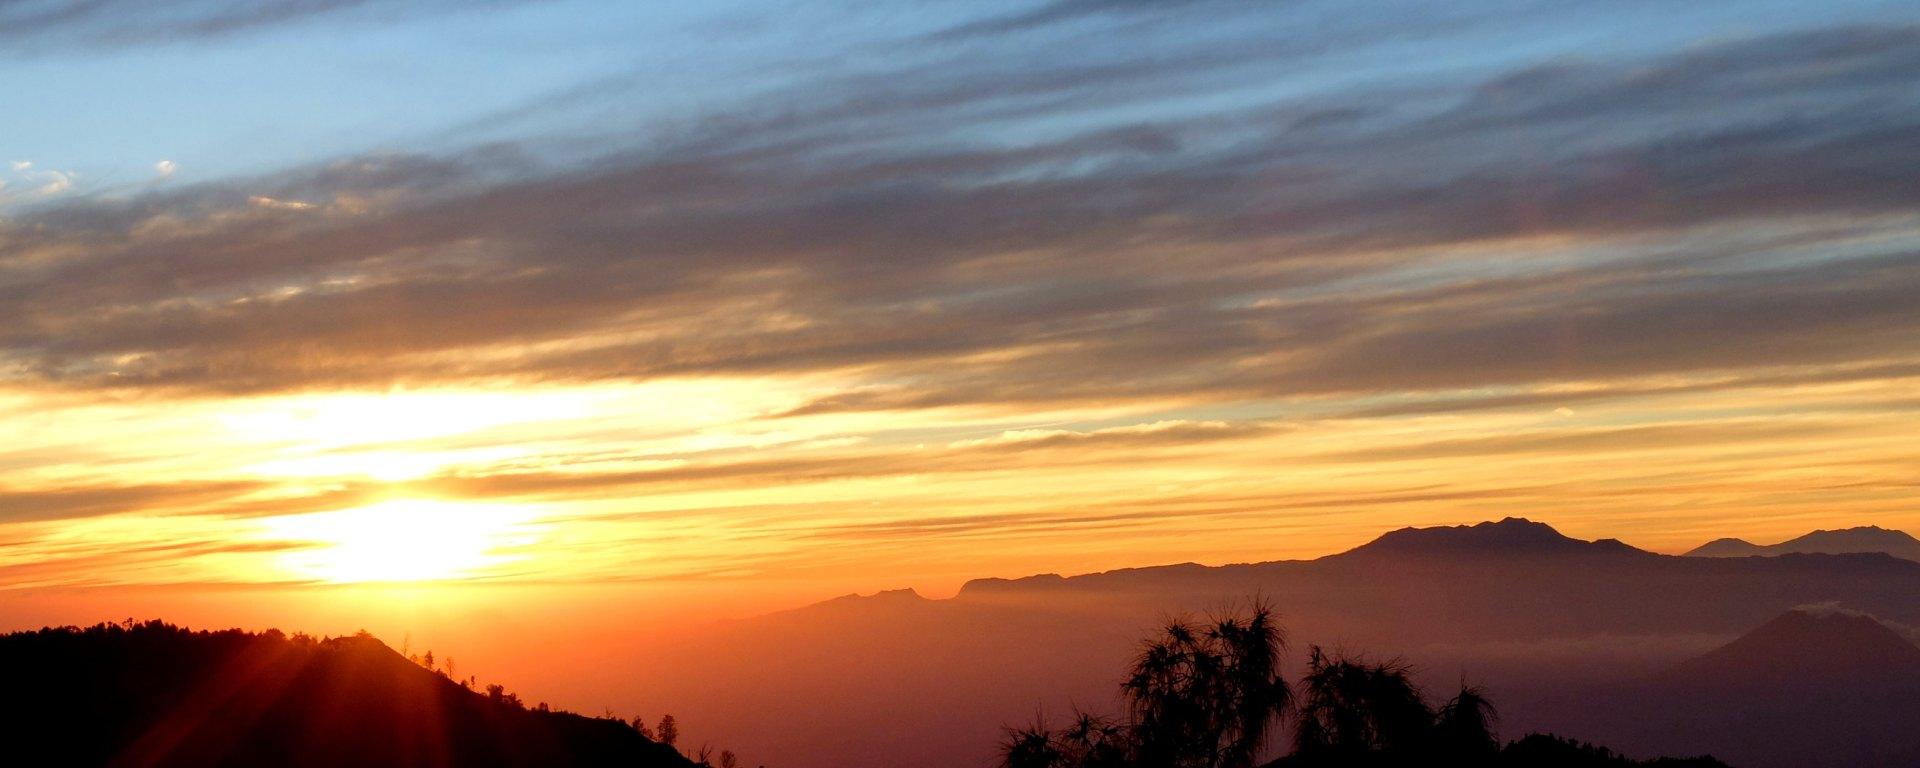 Sunrise Mount Penanjakan